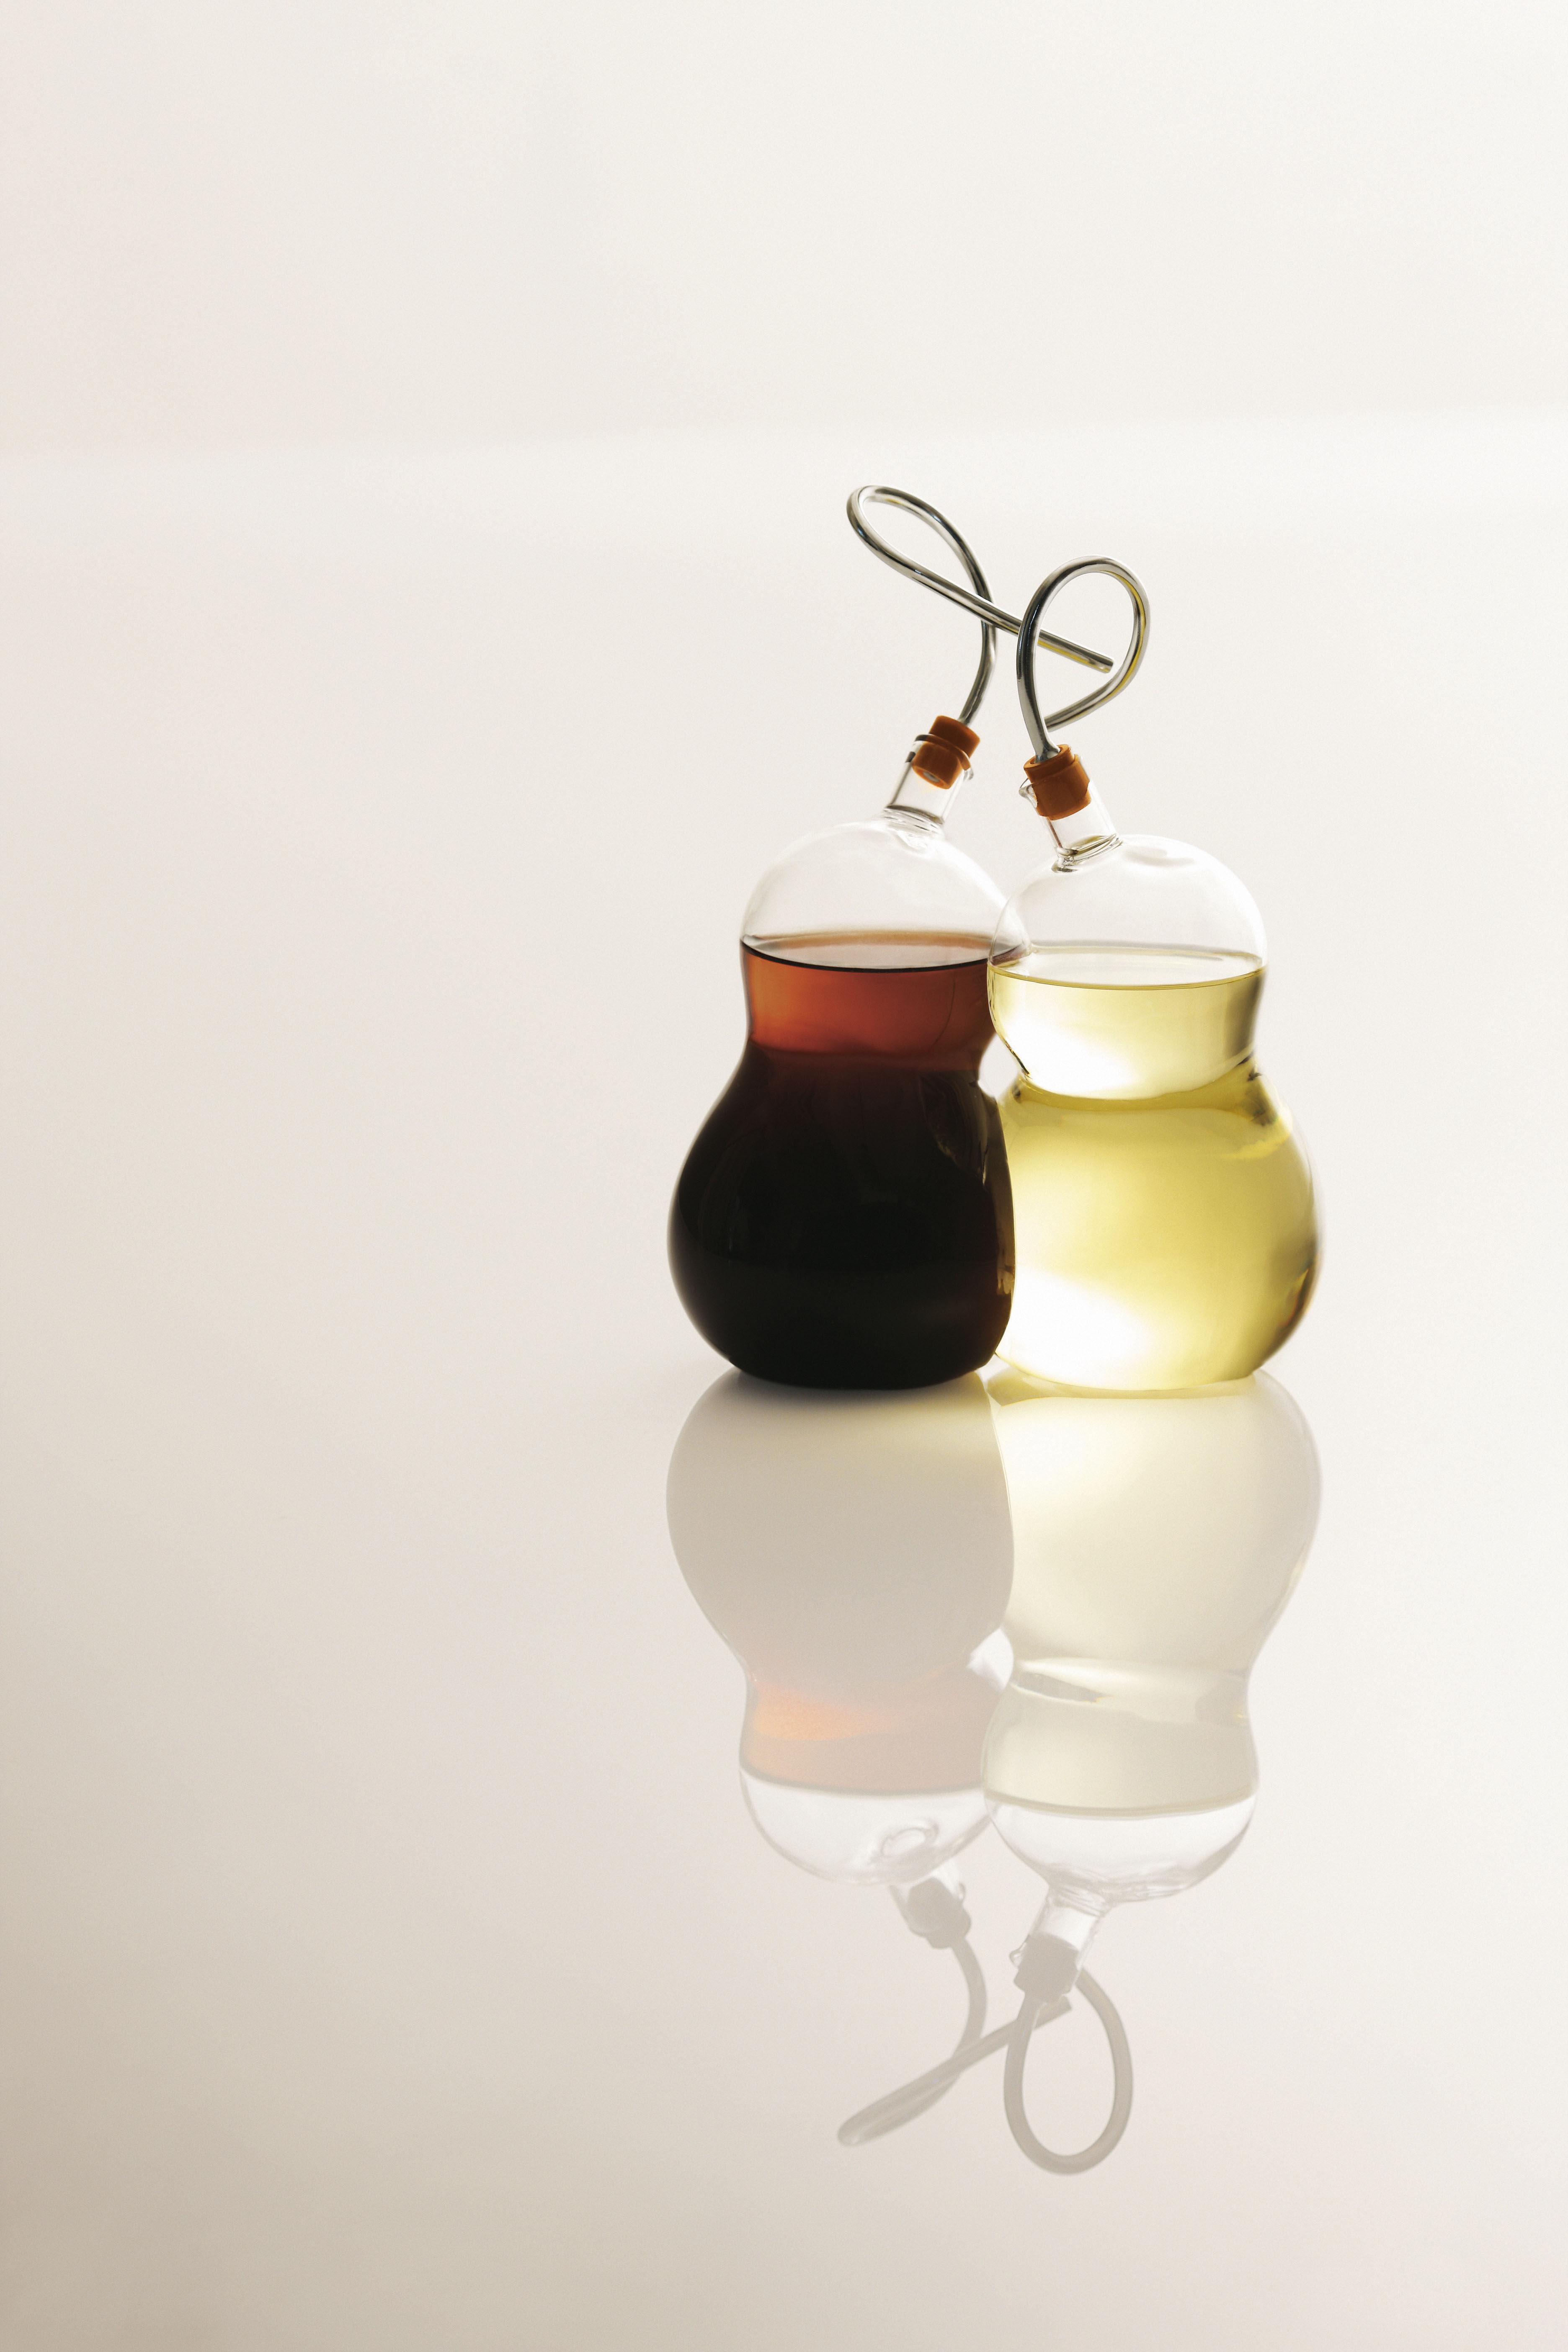 ensemble huilier et vinaigrier family belongings hulu. Black Bedroom Furniture Sets. Home Design Ideas